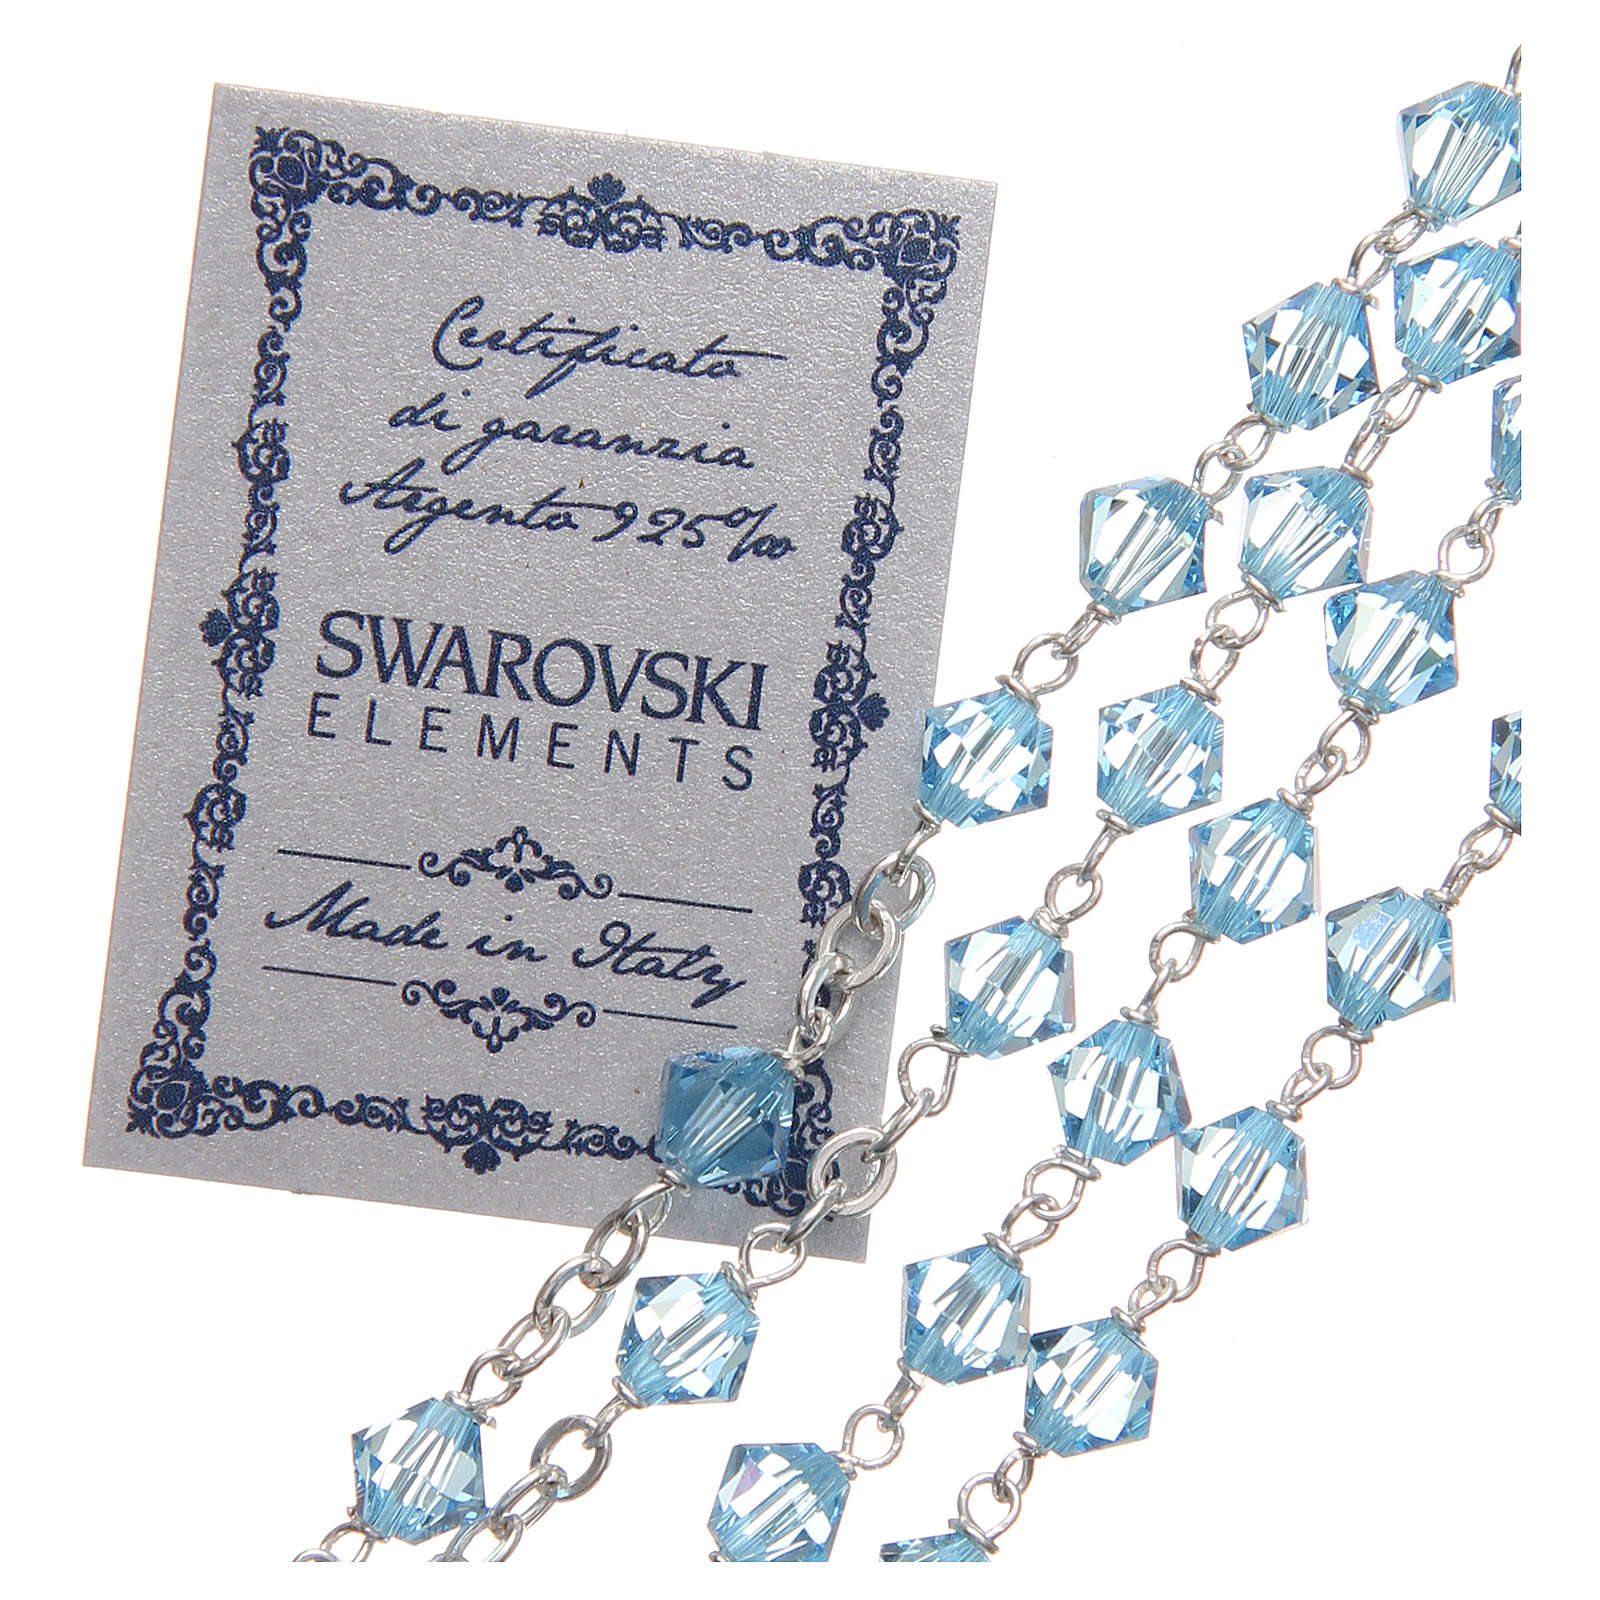 Chapelet argent 925 Swarovski chaîne mailles rondes 6 mm bleu ciel 4